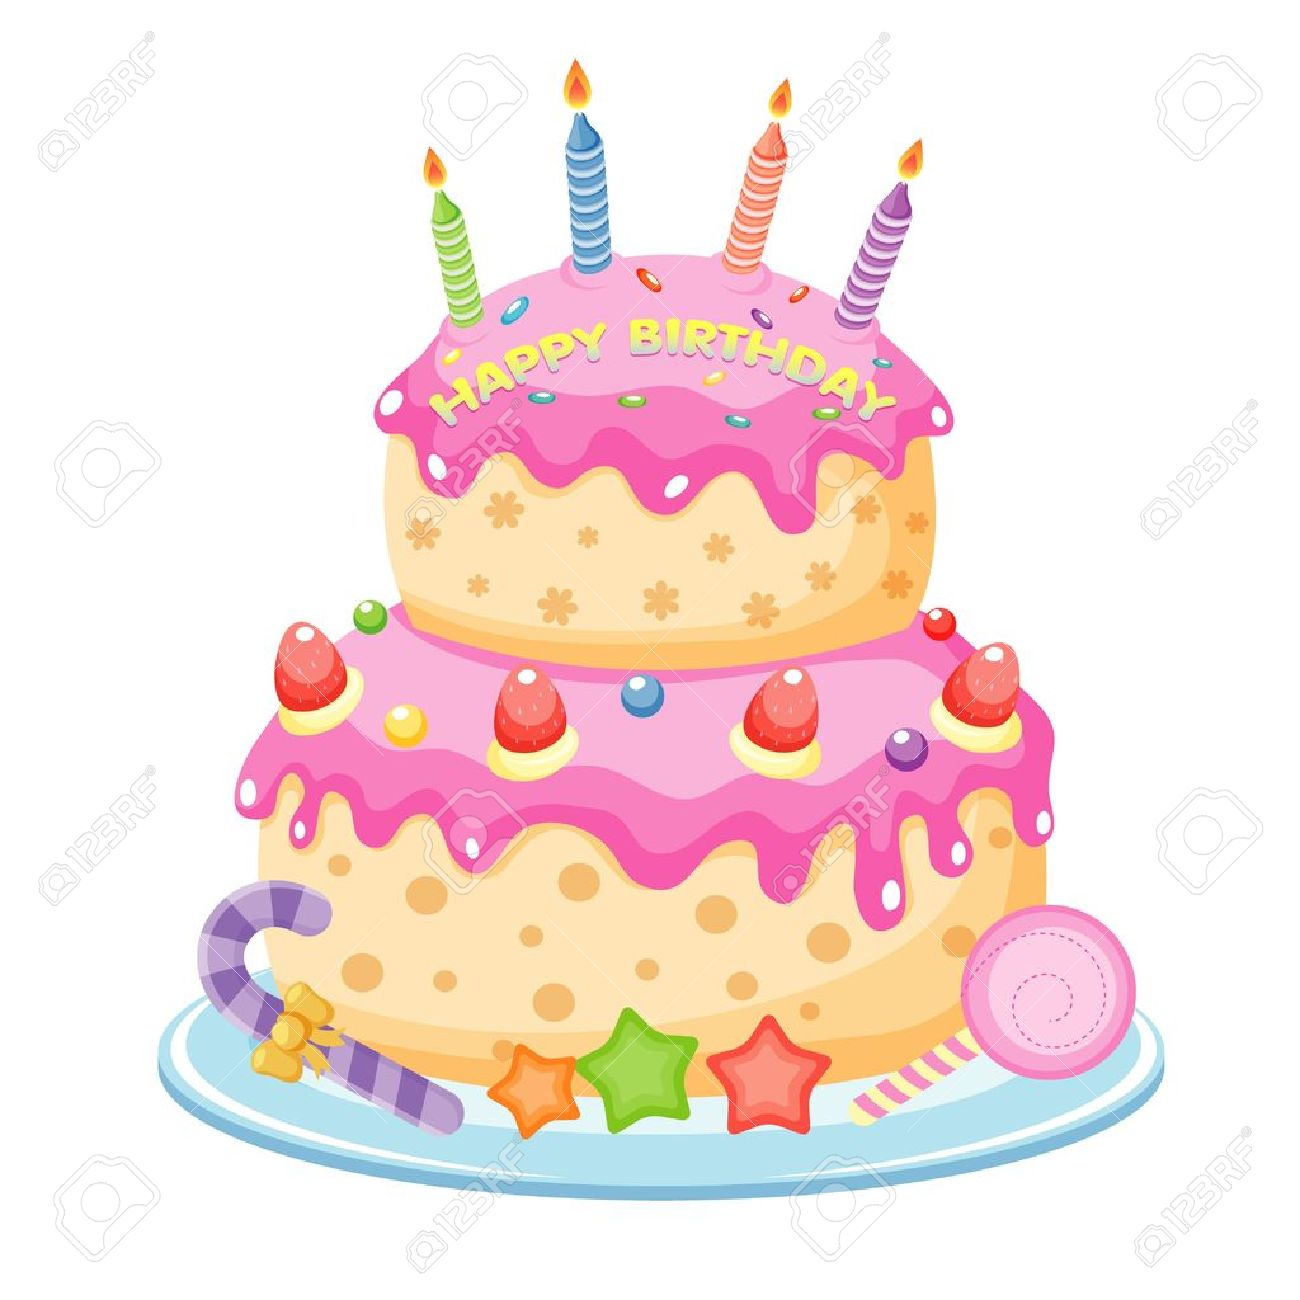 hight resolution of birthday cake illustration